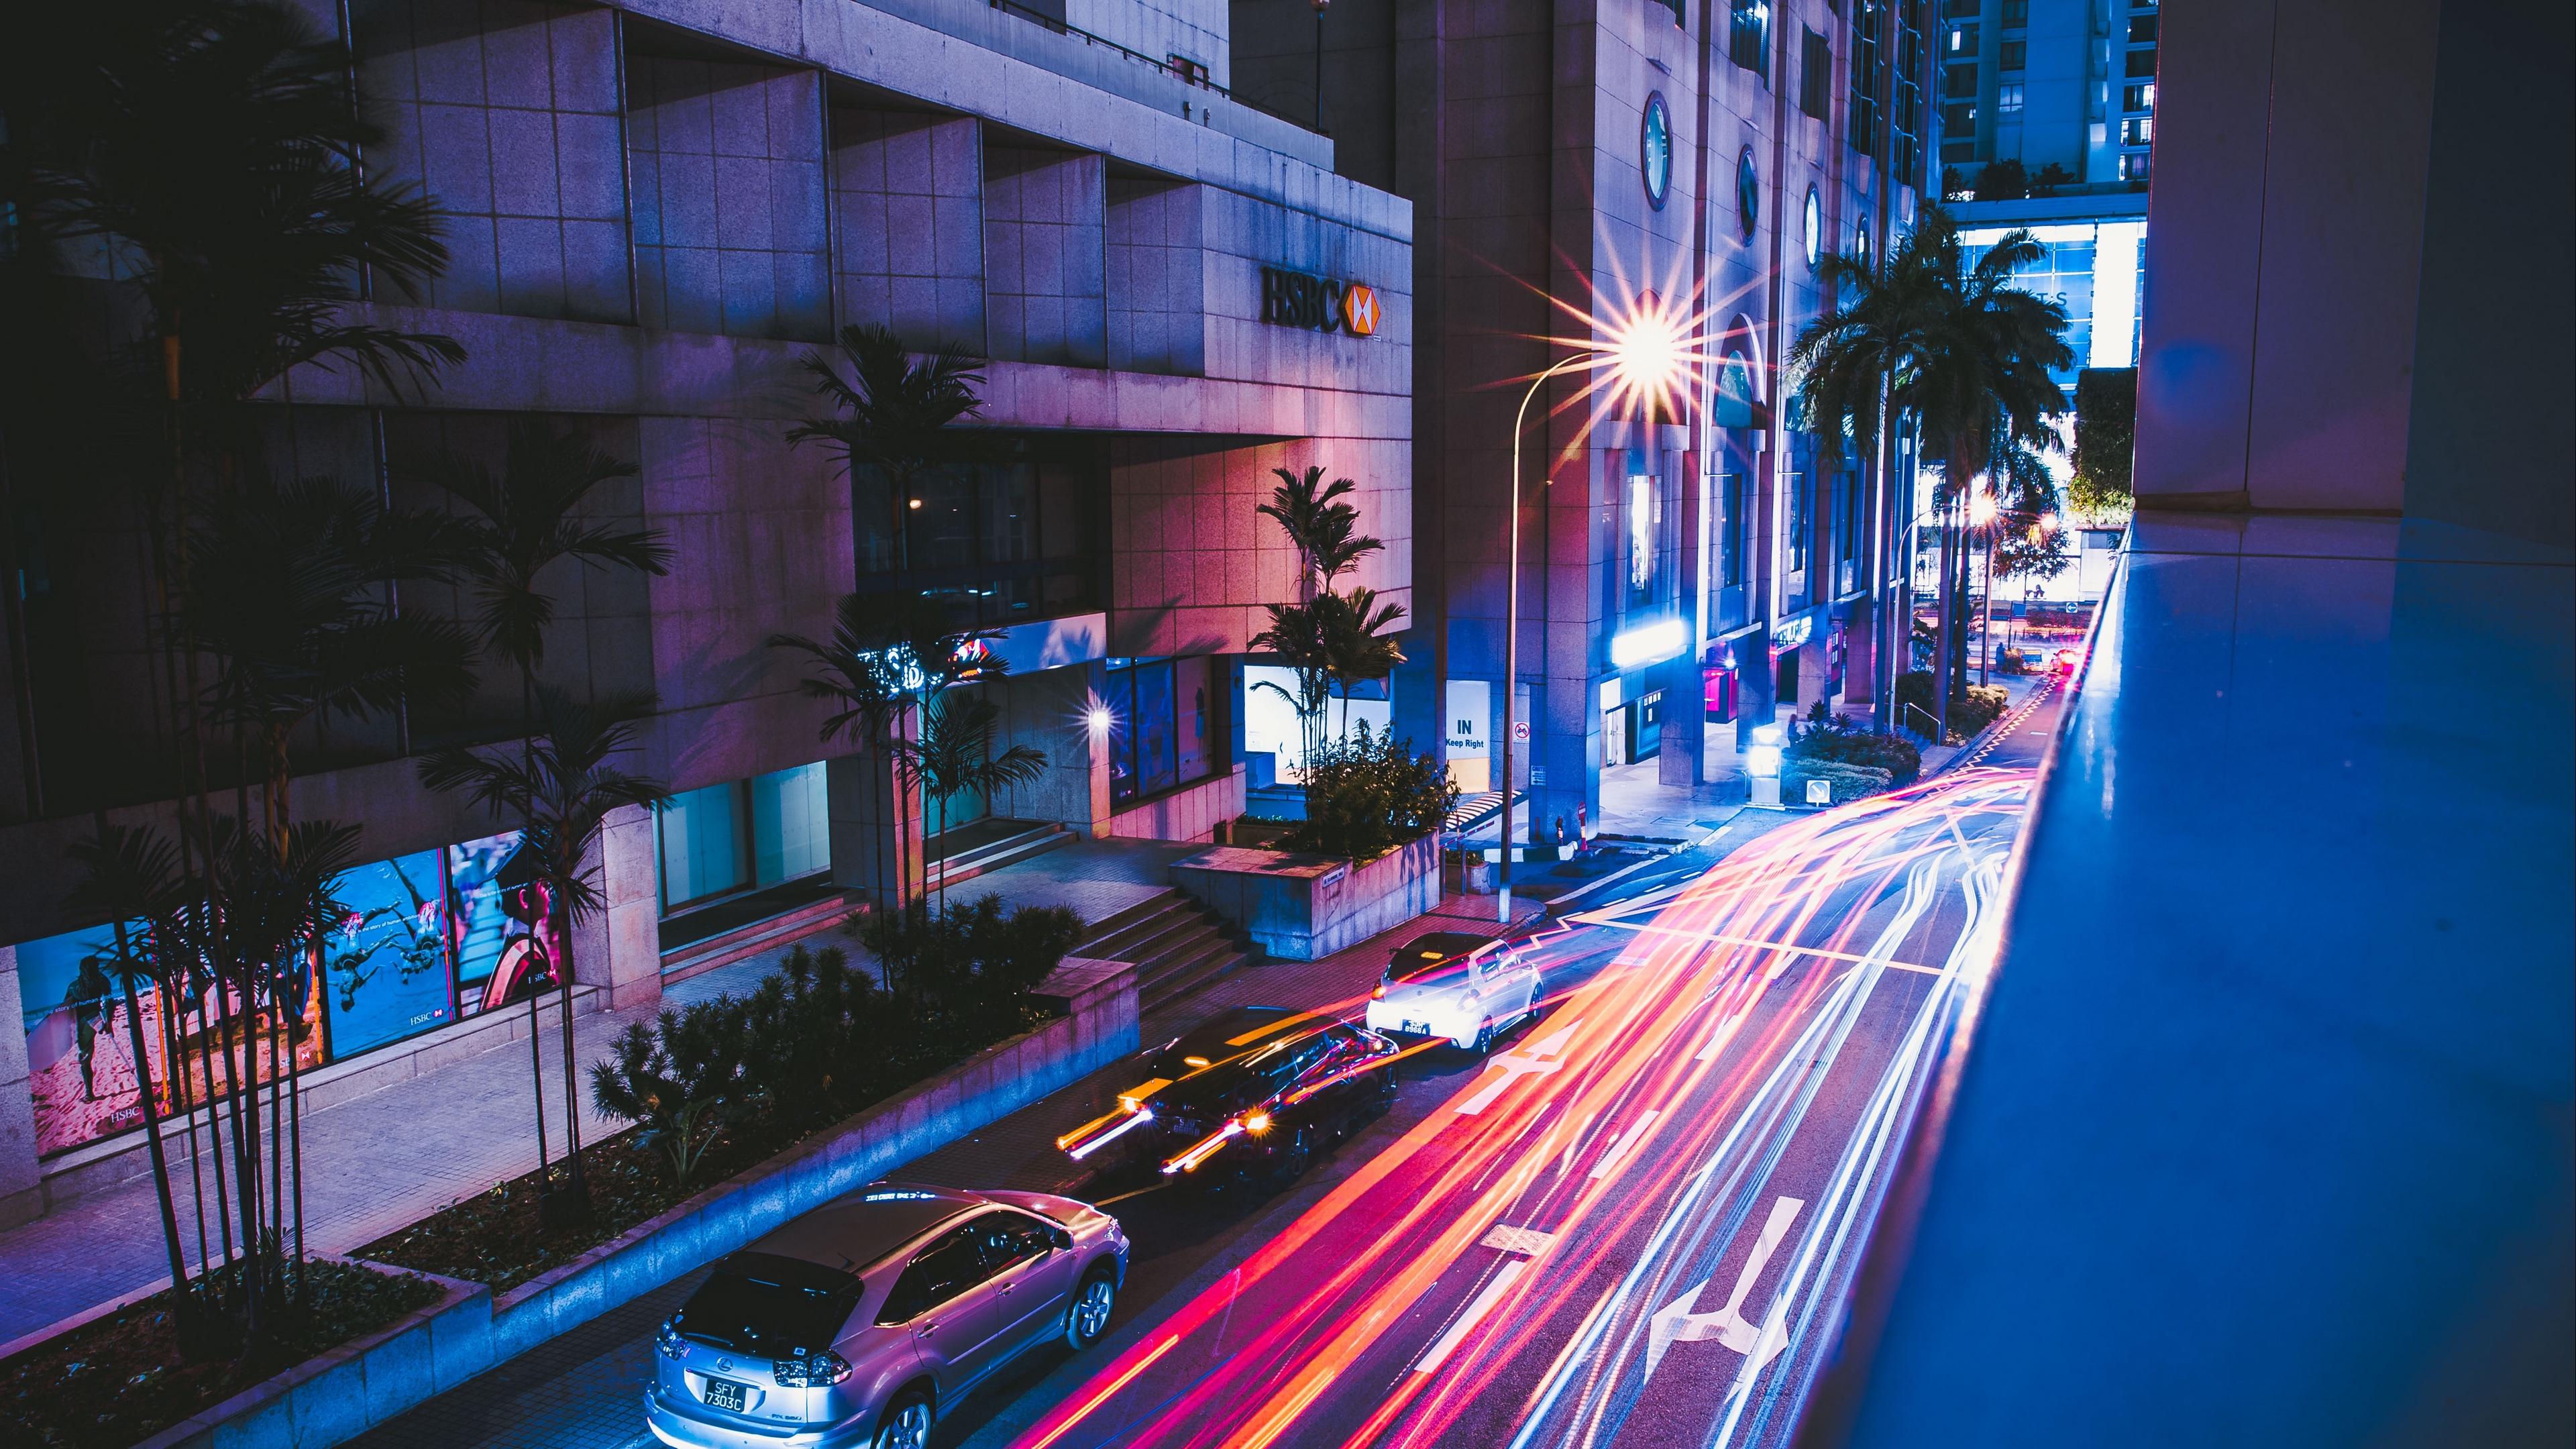 street city night cars 4k 1538065467 - street, city, night, cars 4k - Street, Night, City